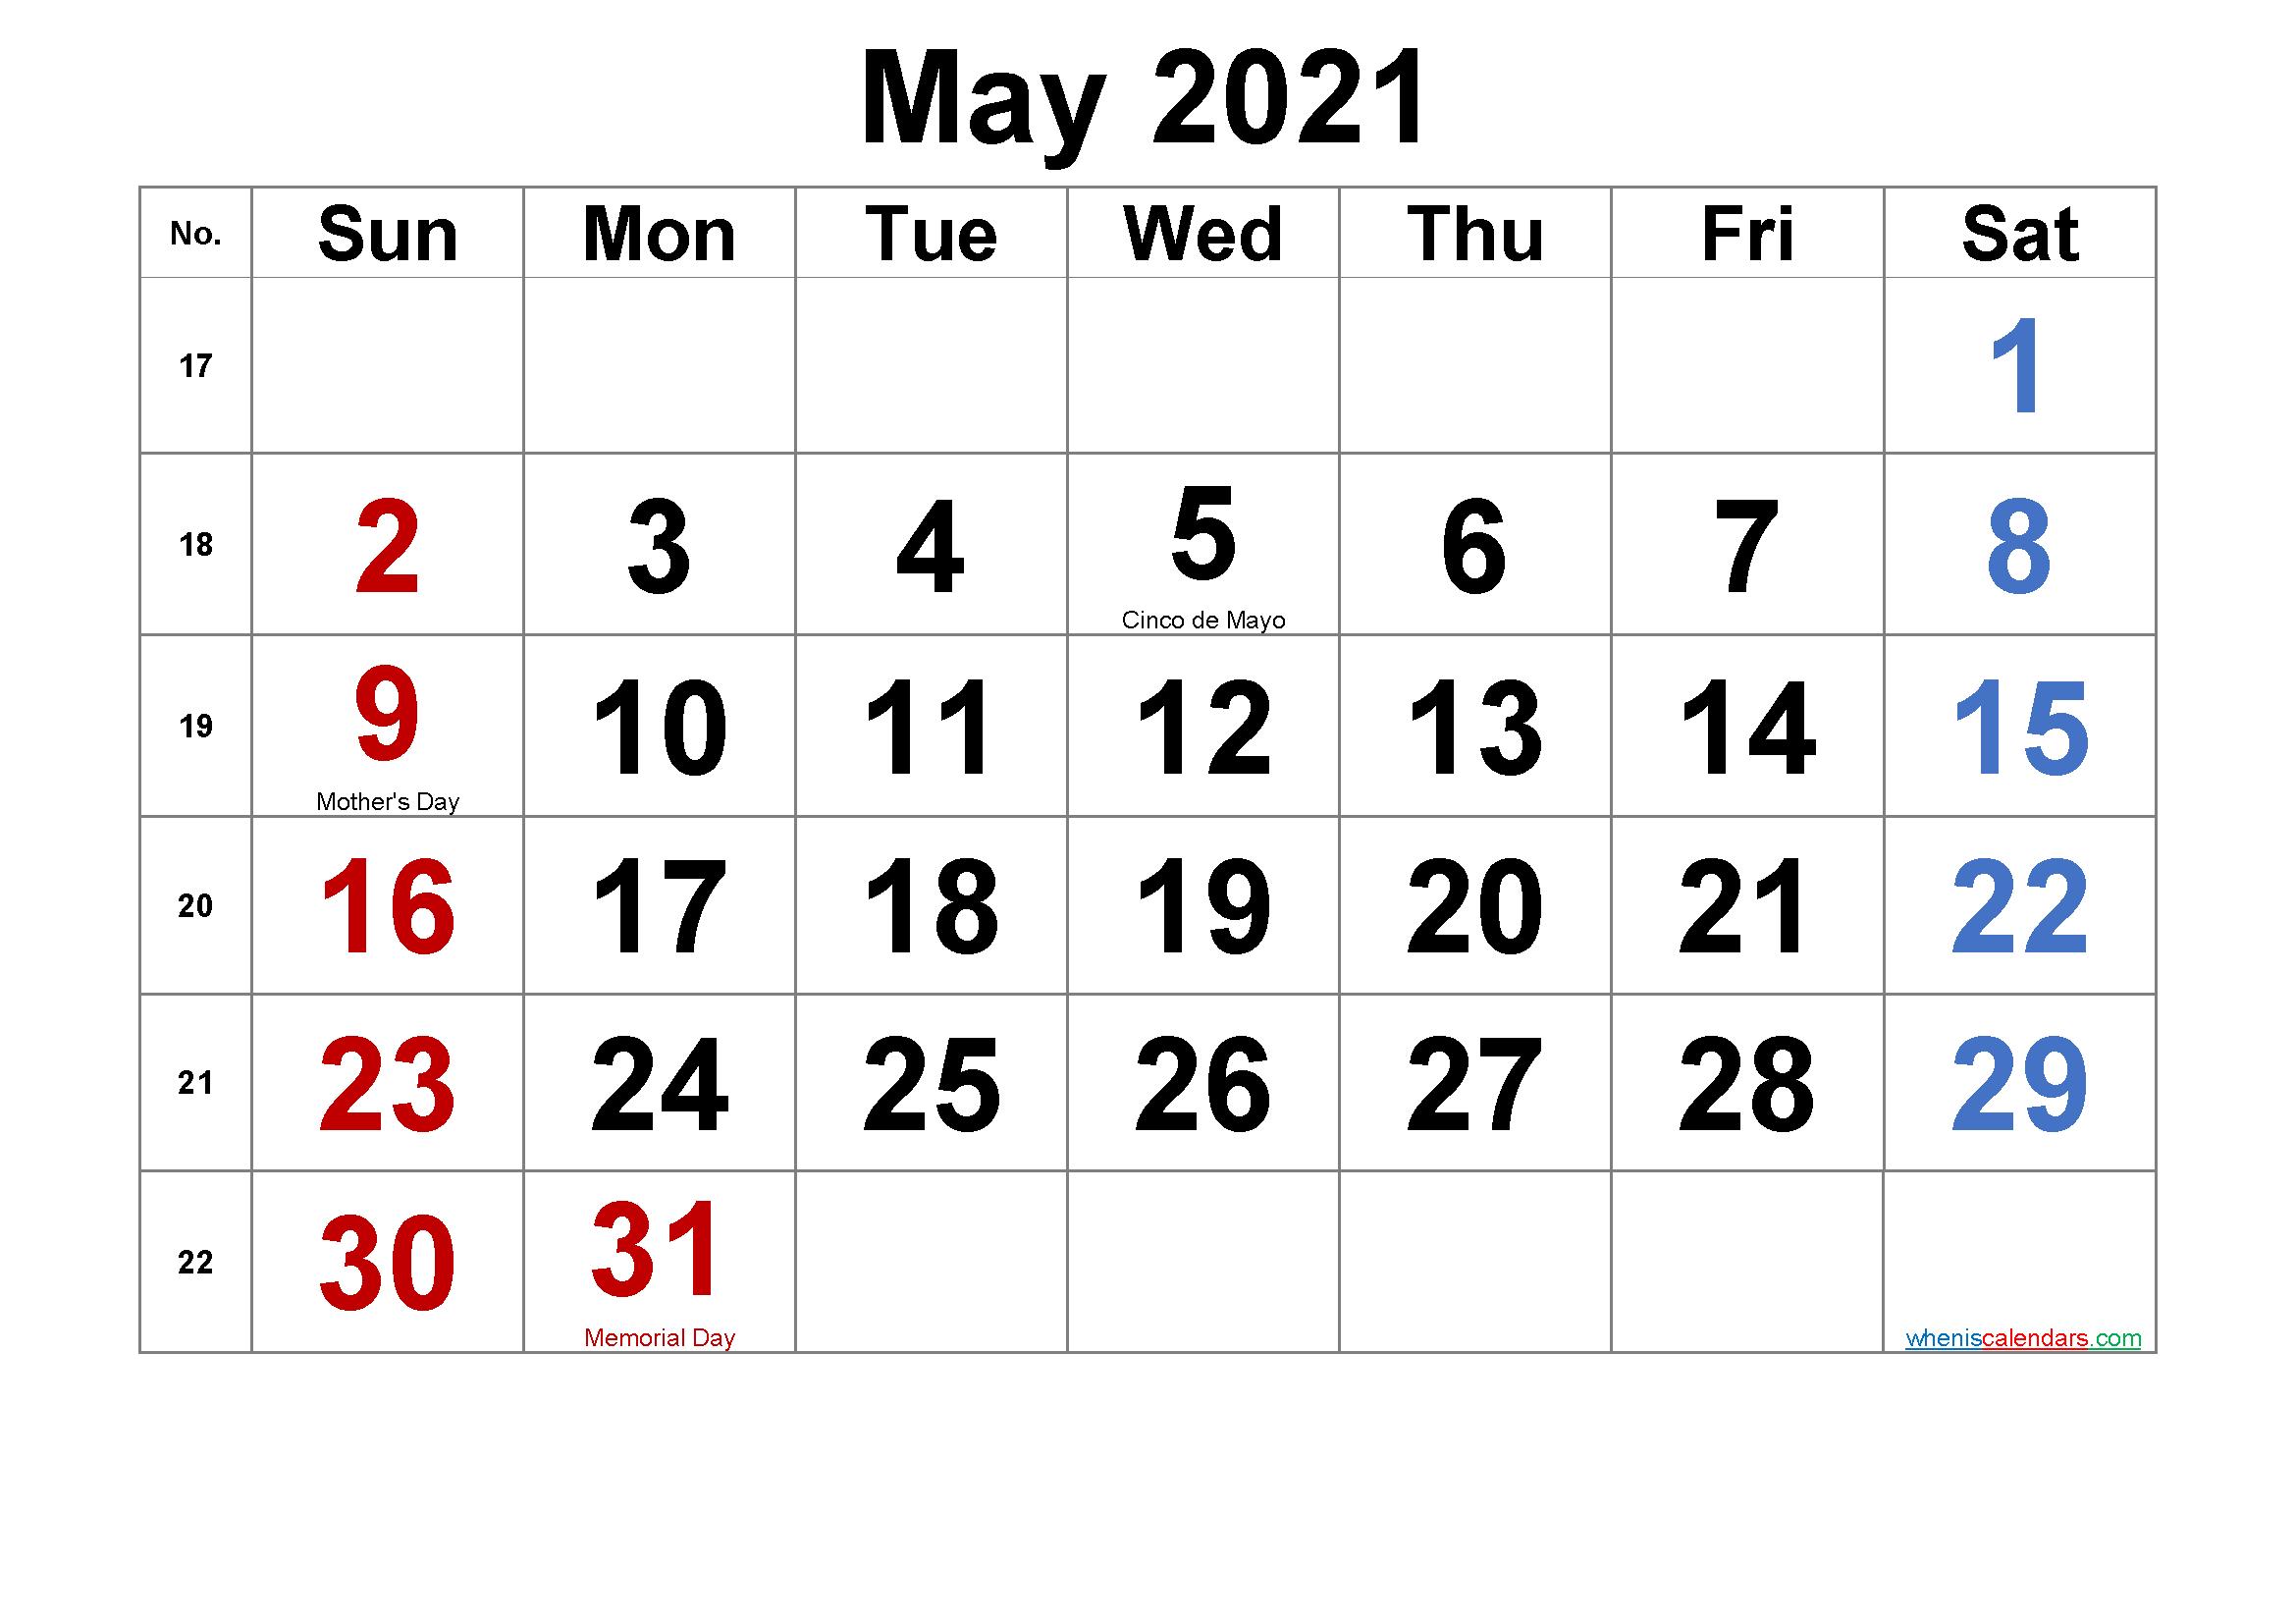 Memorial Day 2021 Calendar | Free 2021 Printable Calendars inside Free Printable Calendar With Lines On Days 2021